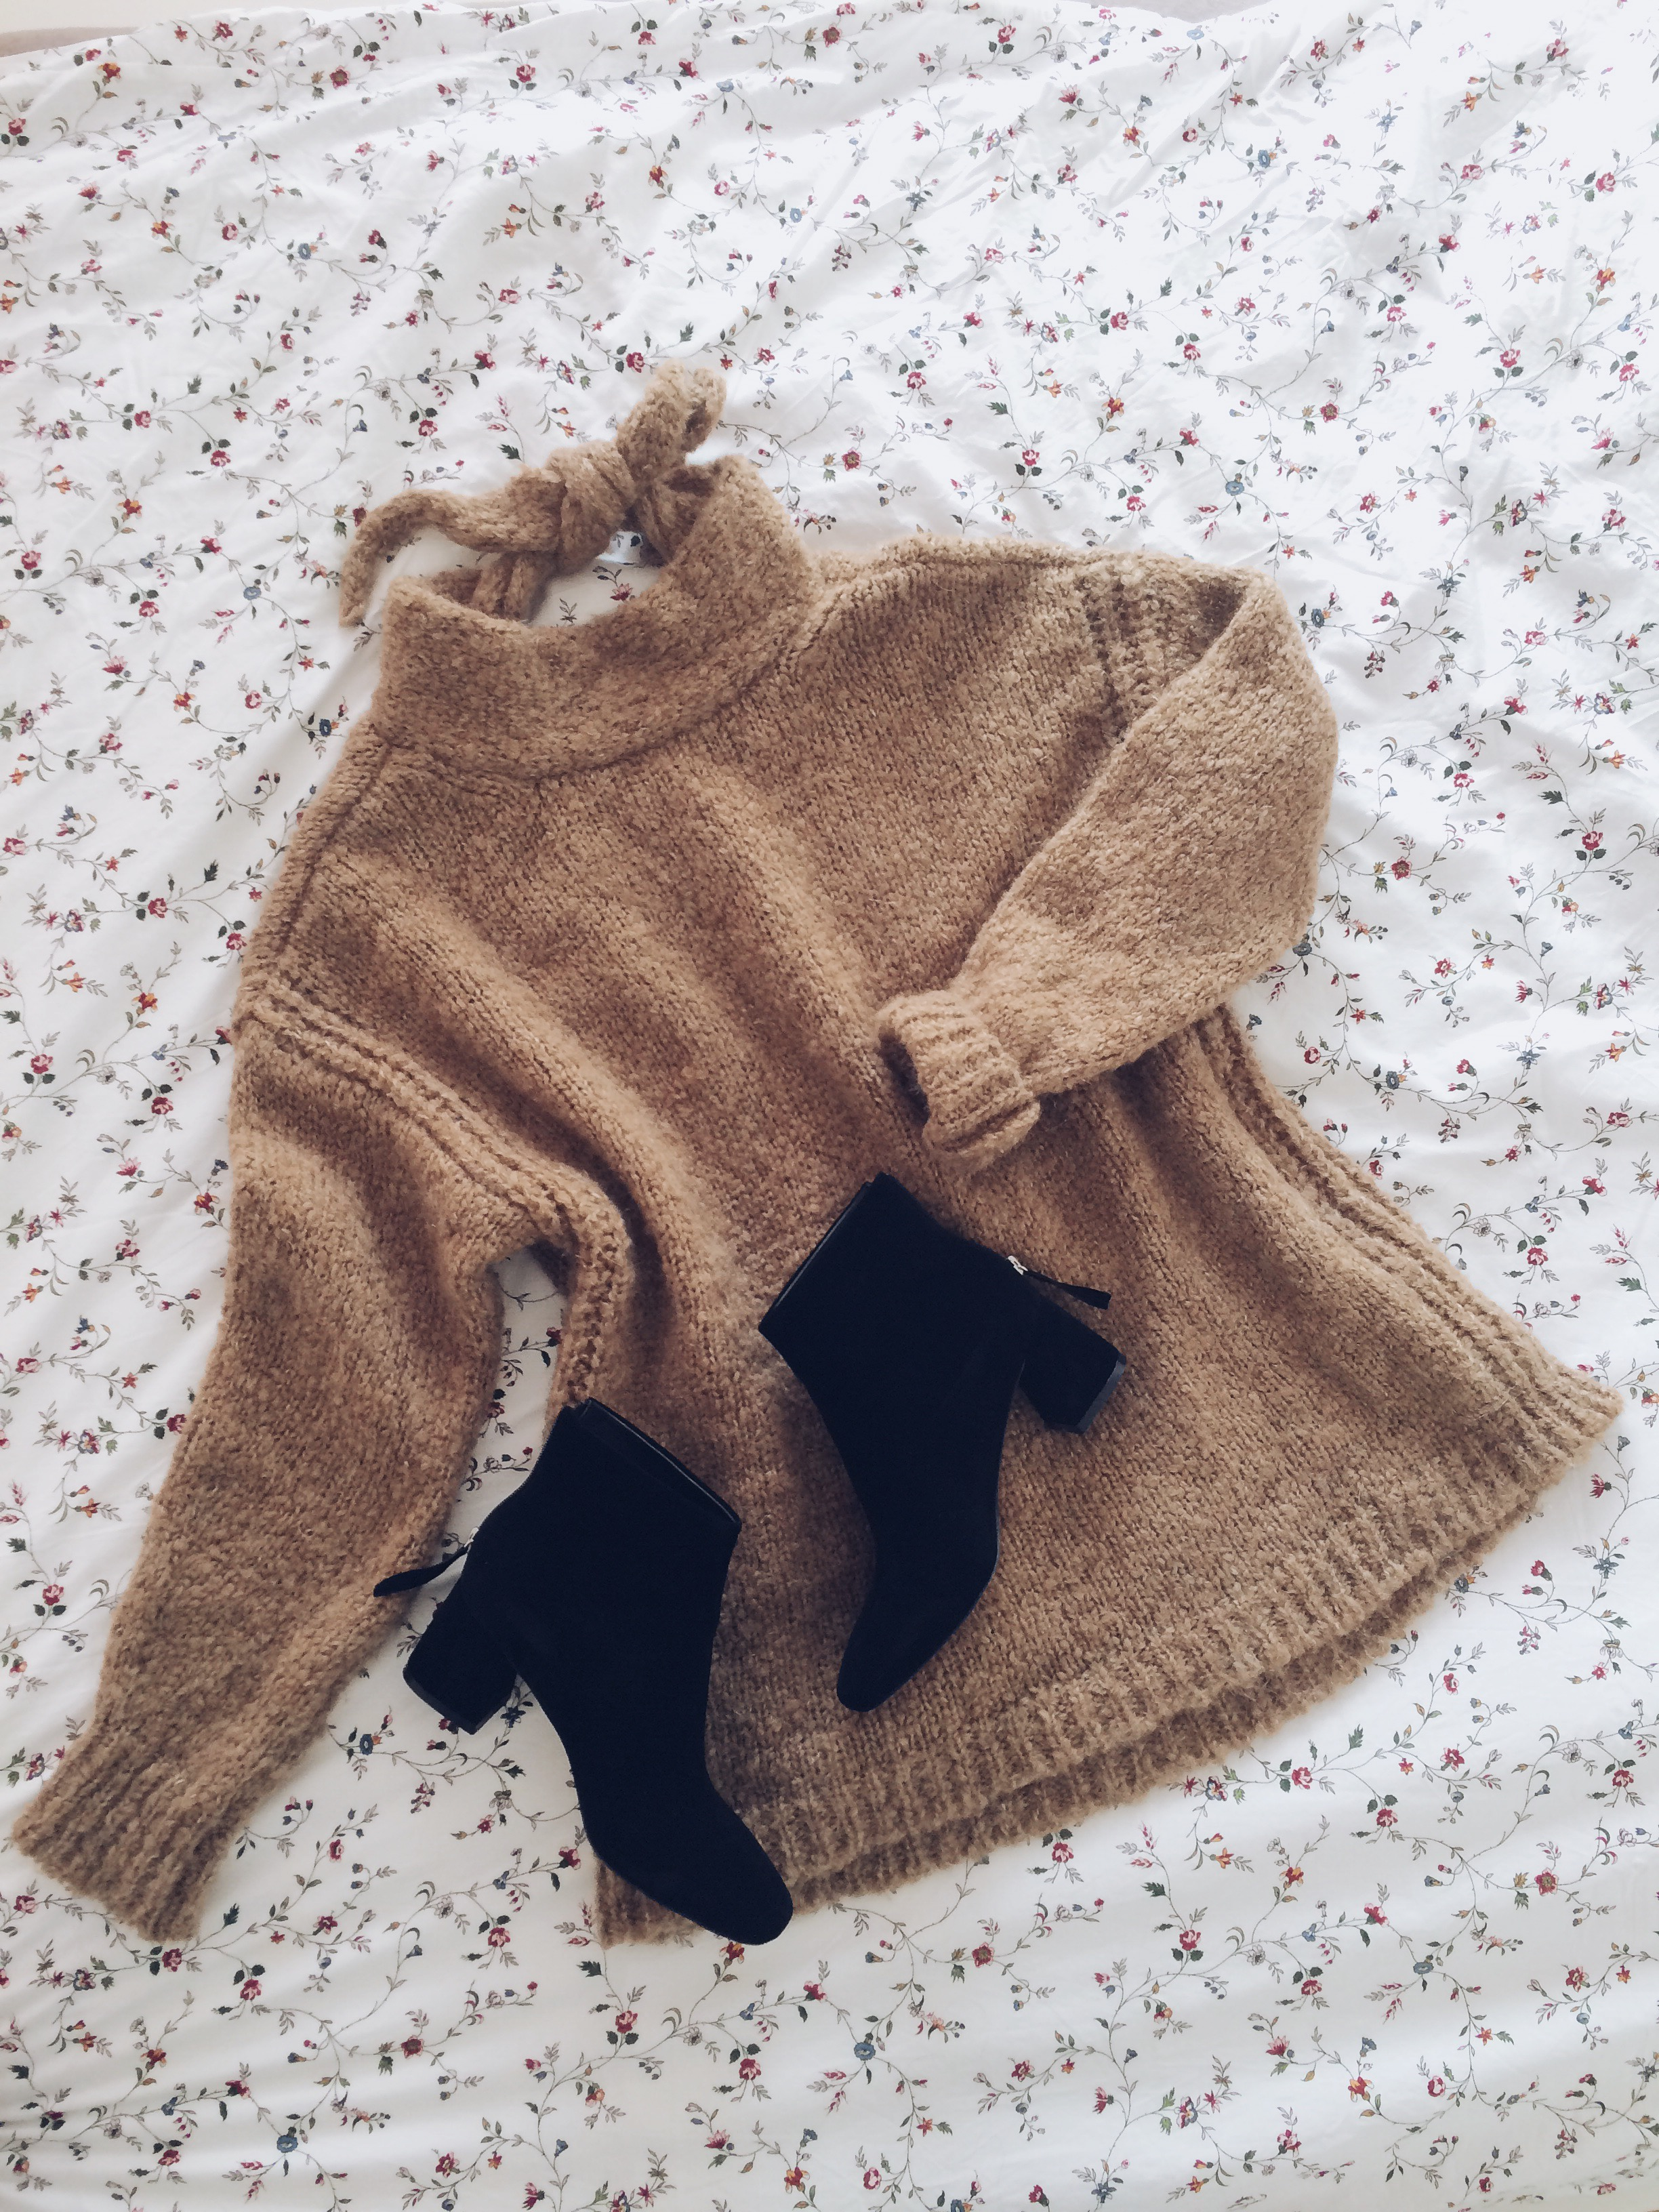 jaki sweter kupić na zimę